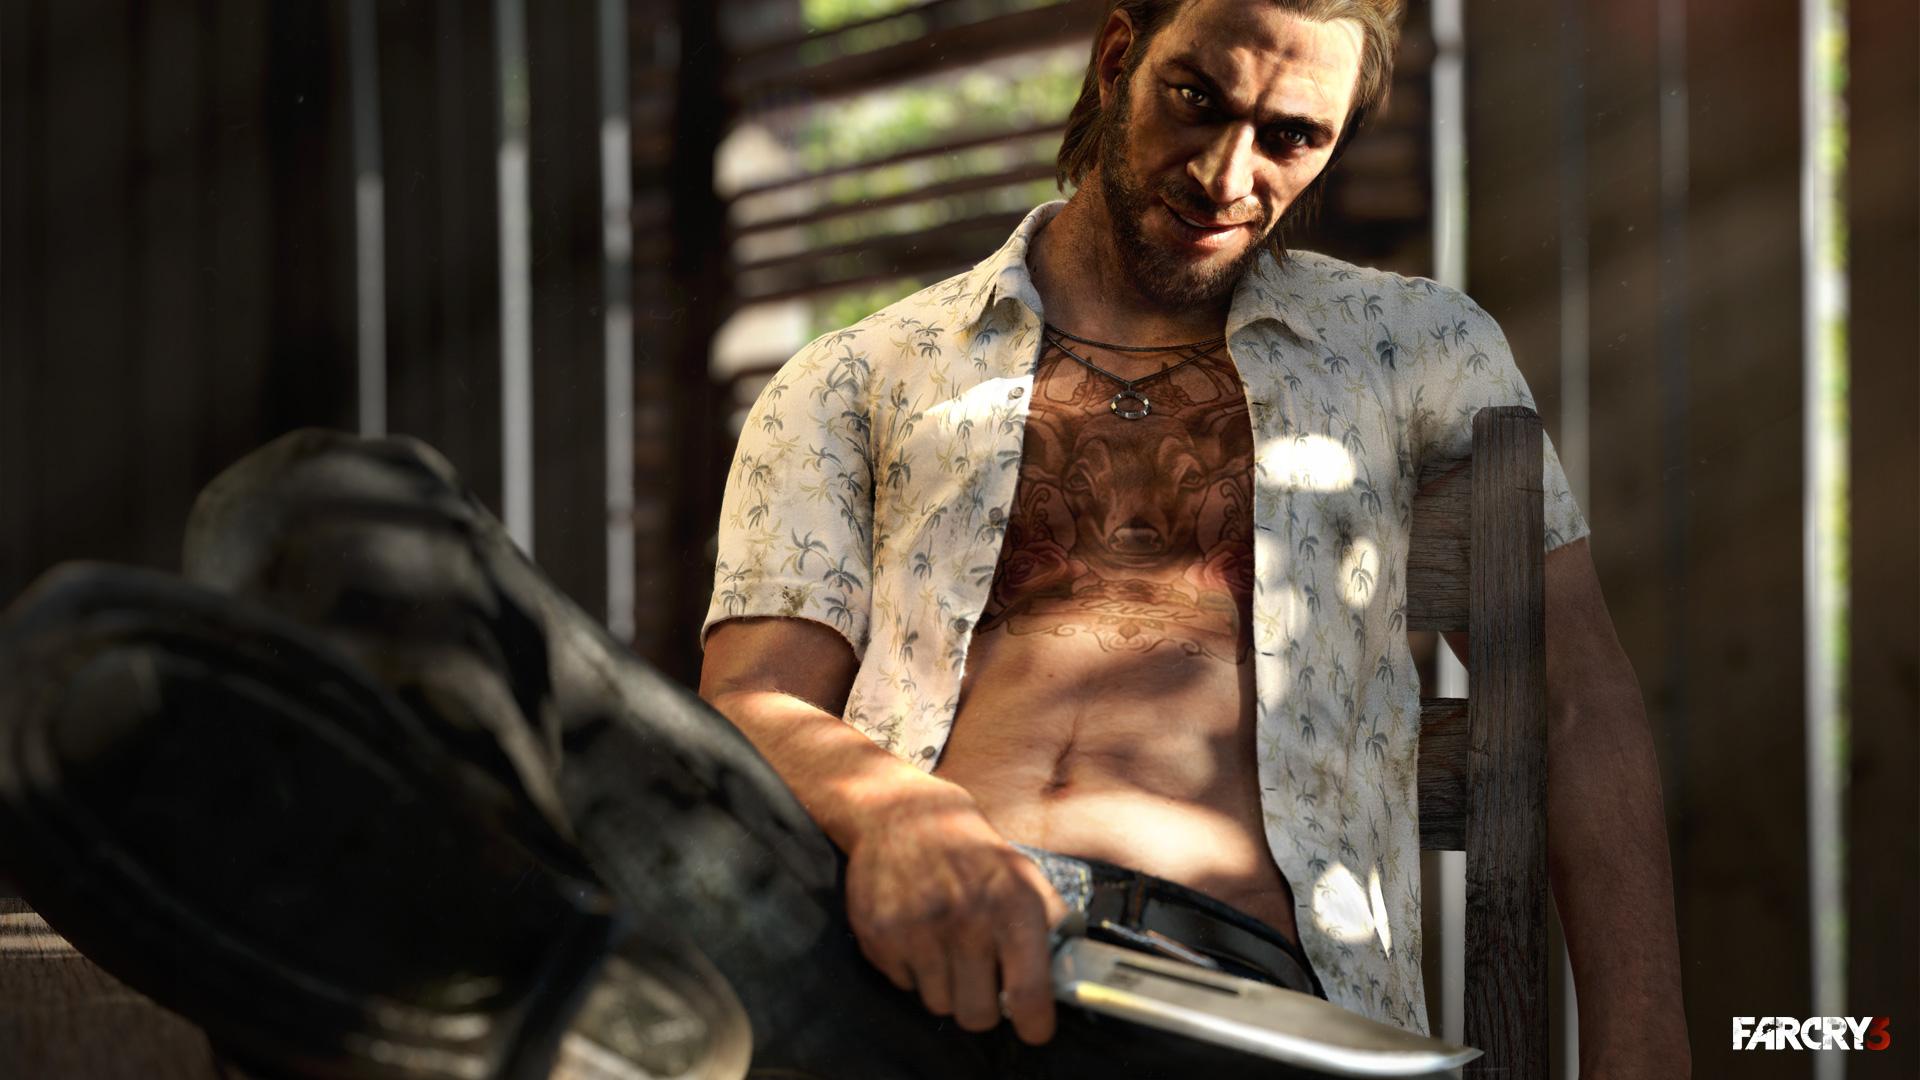 Wallpaper Video Games Far Cry 3 Buck 1920x1080 Sandwich